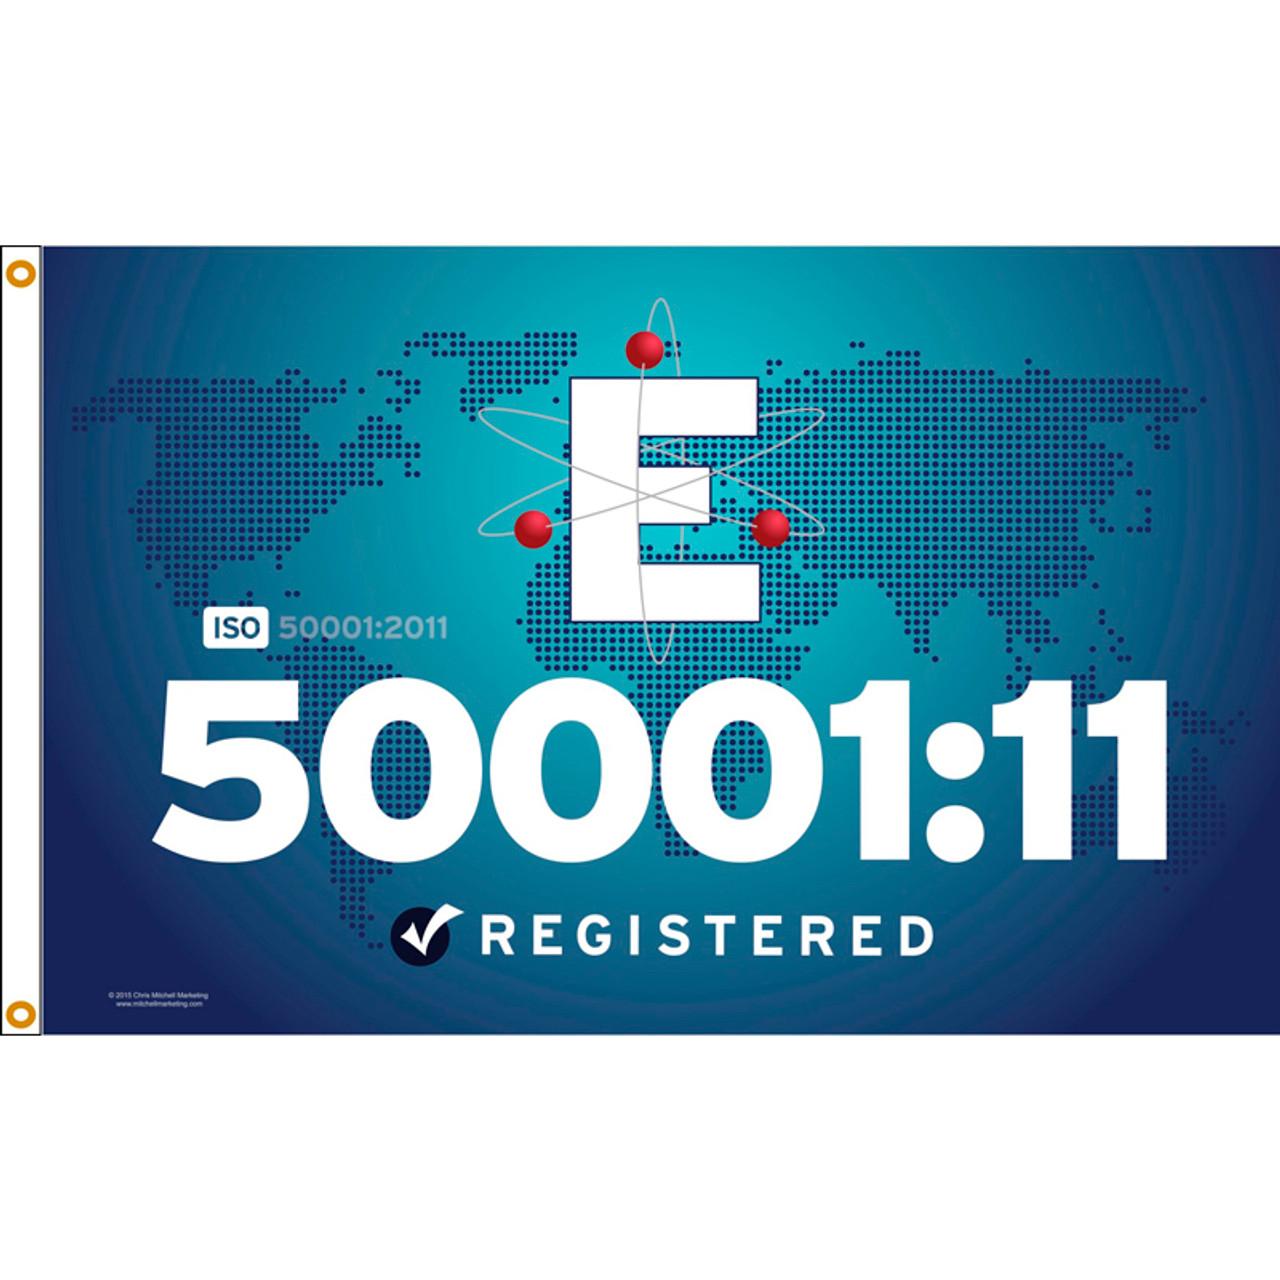 ISO 50001/11 Flag